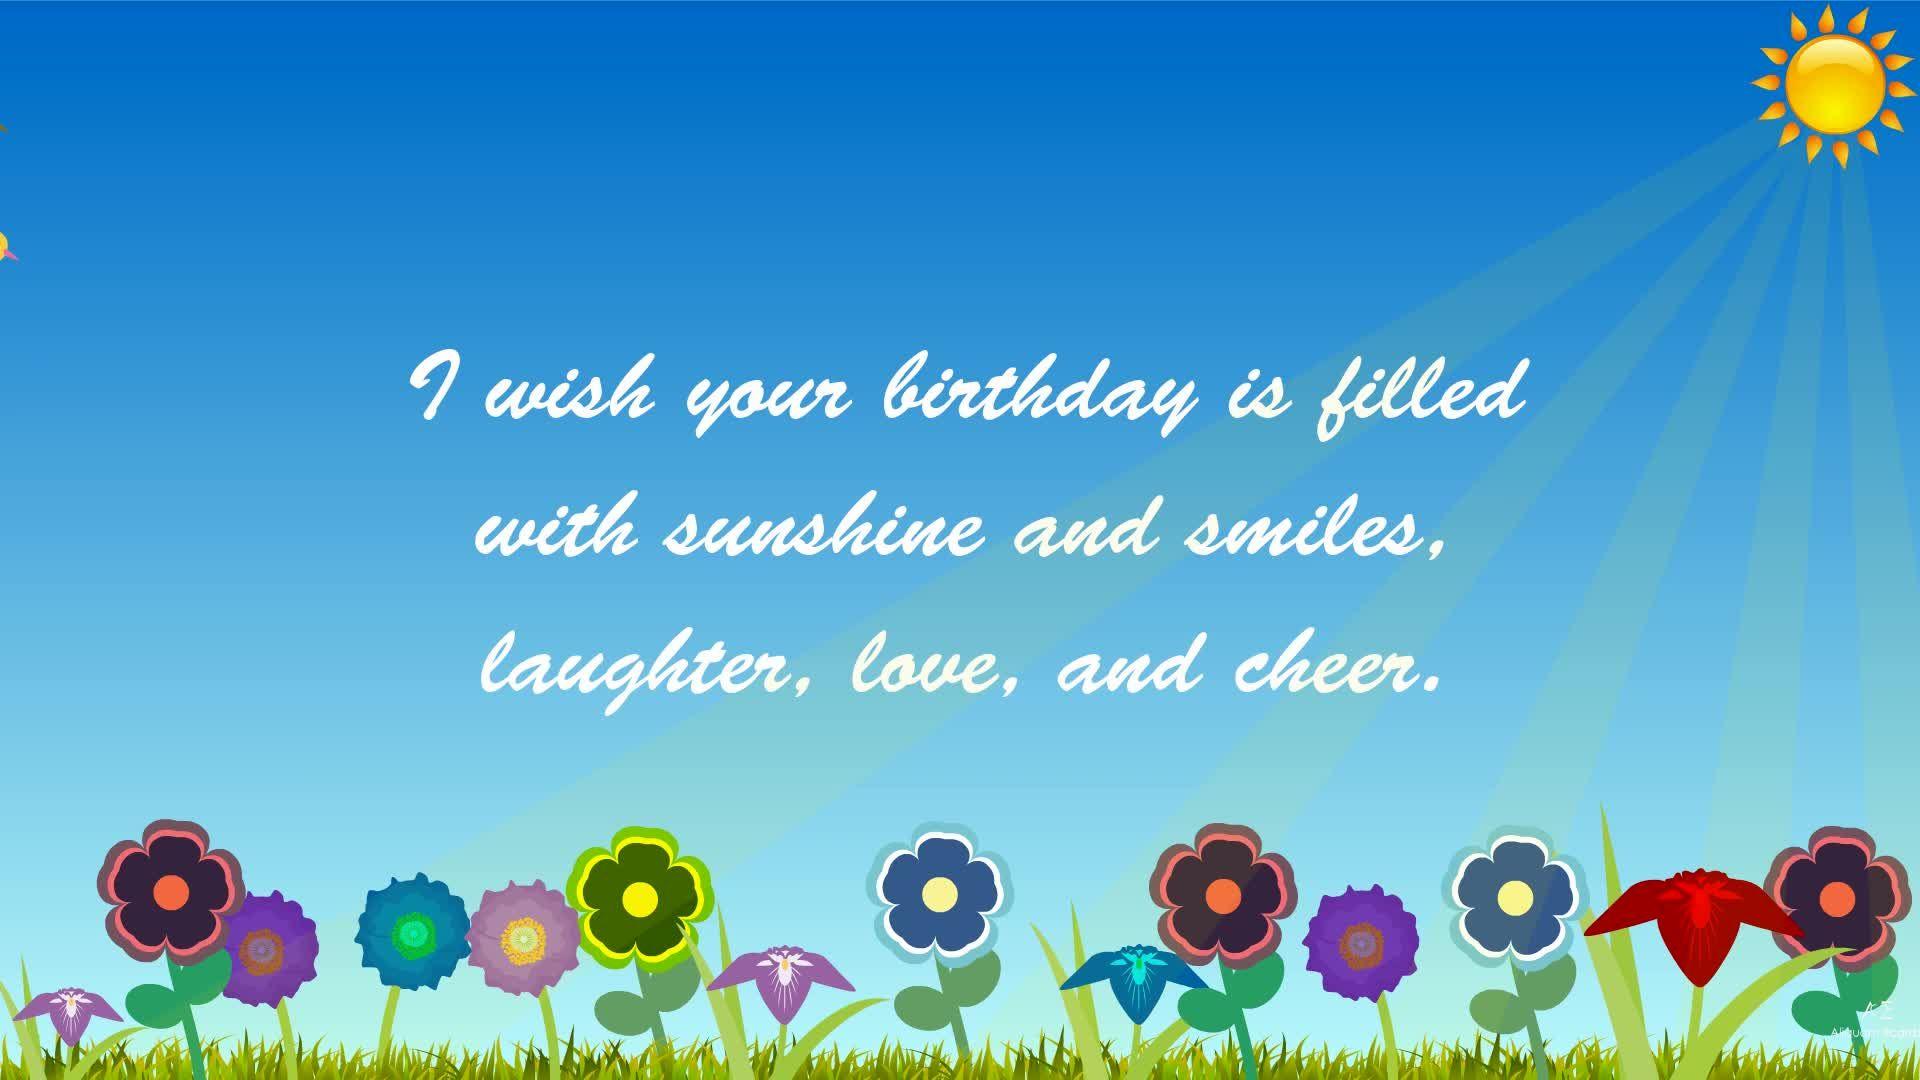 Birthday animated e card e cards pinterest happy birthday birthday animated e card m4hsunfo Choice Image